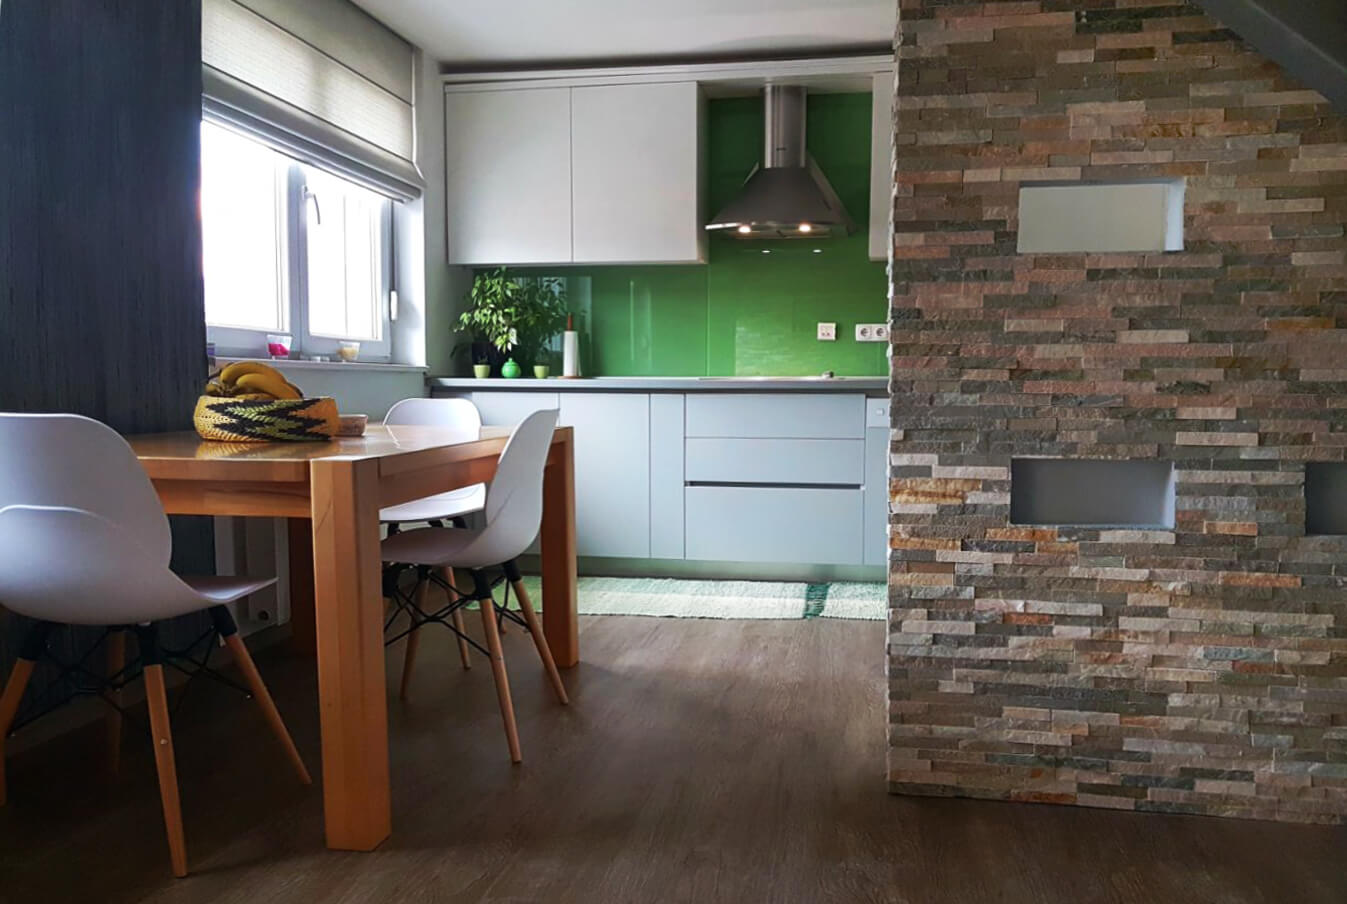 nova-ambienta-kuhinje-kuhinja od oplemenjenog iverala-6